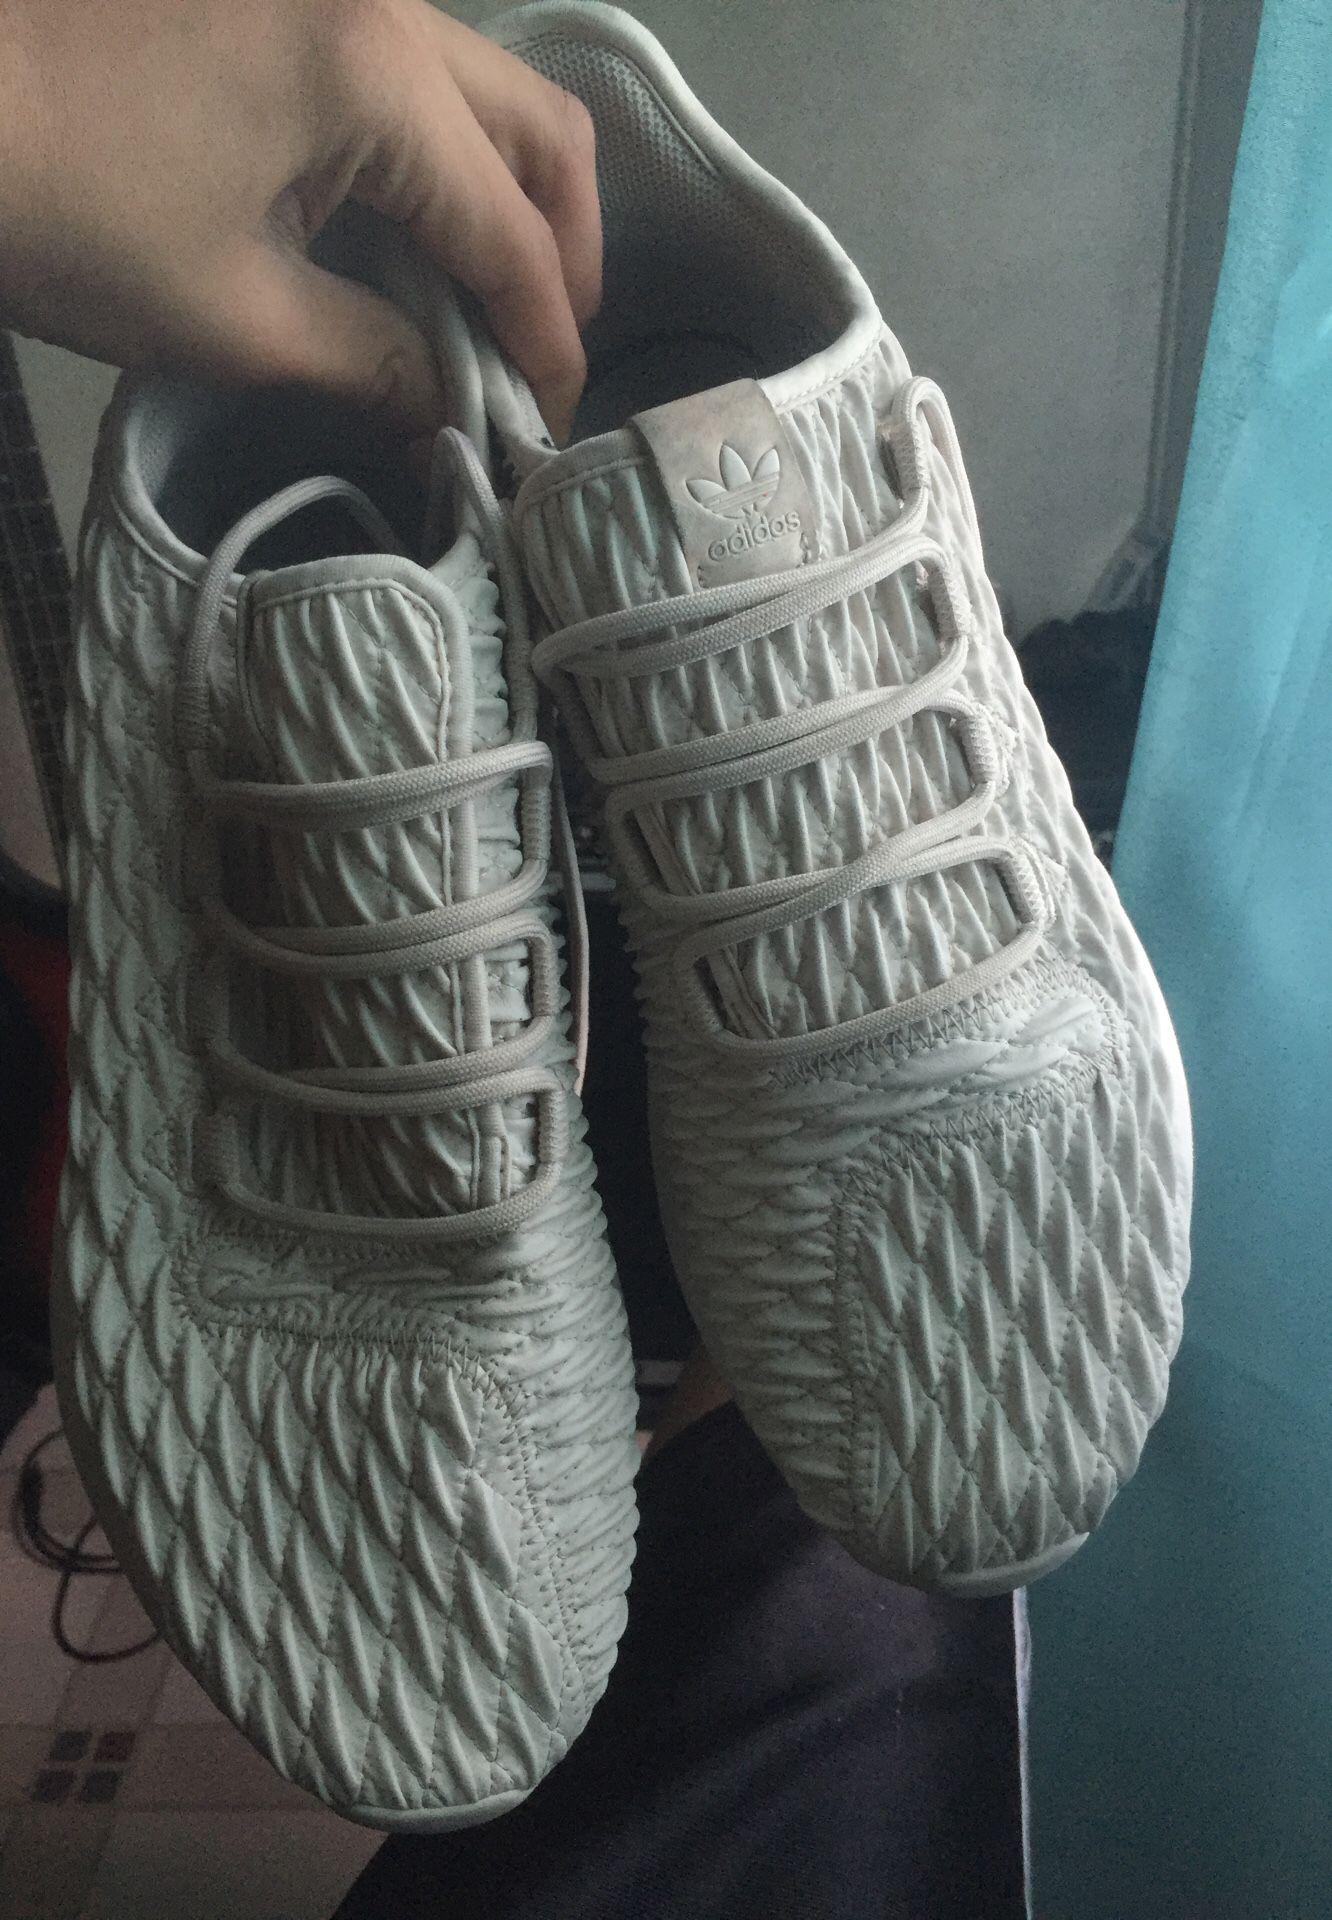 Adidas tubular shadows